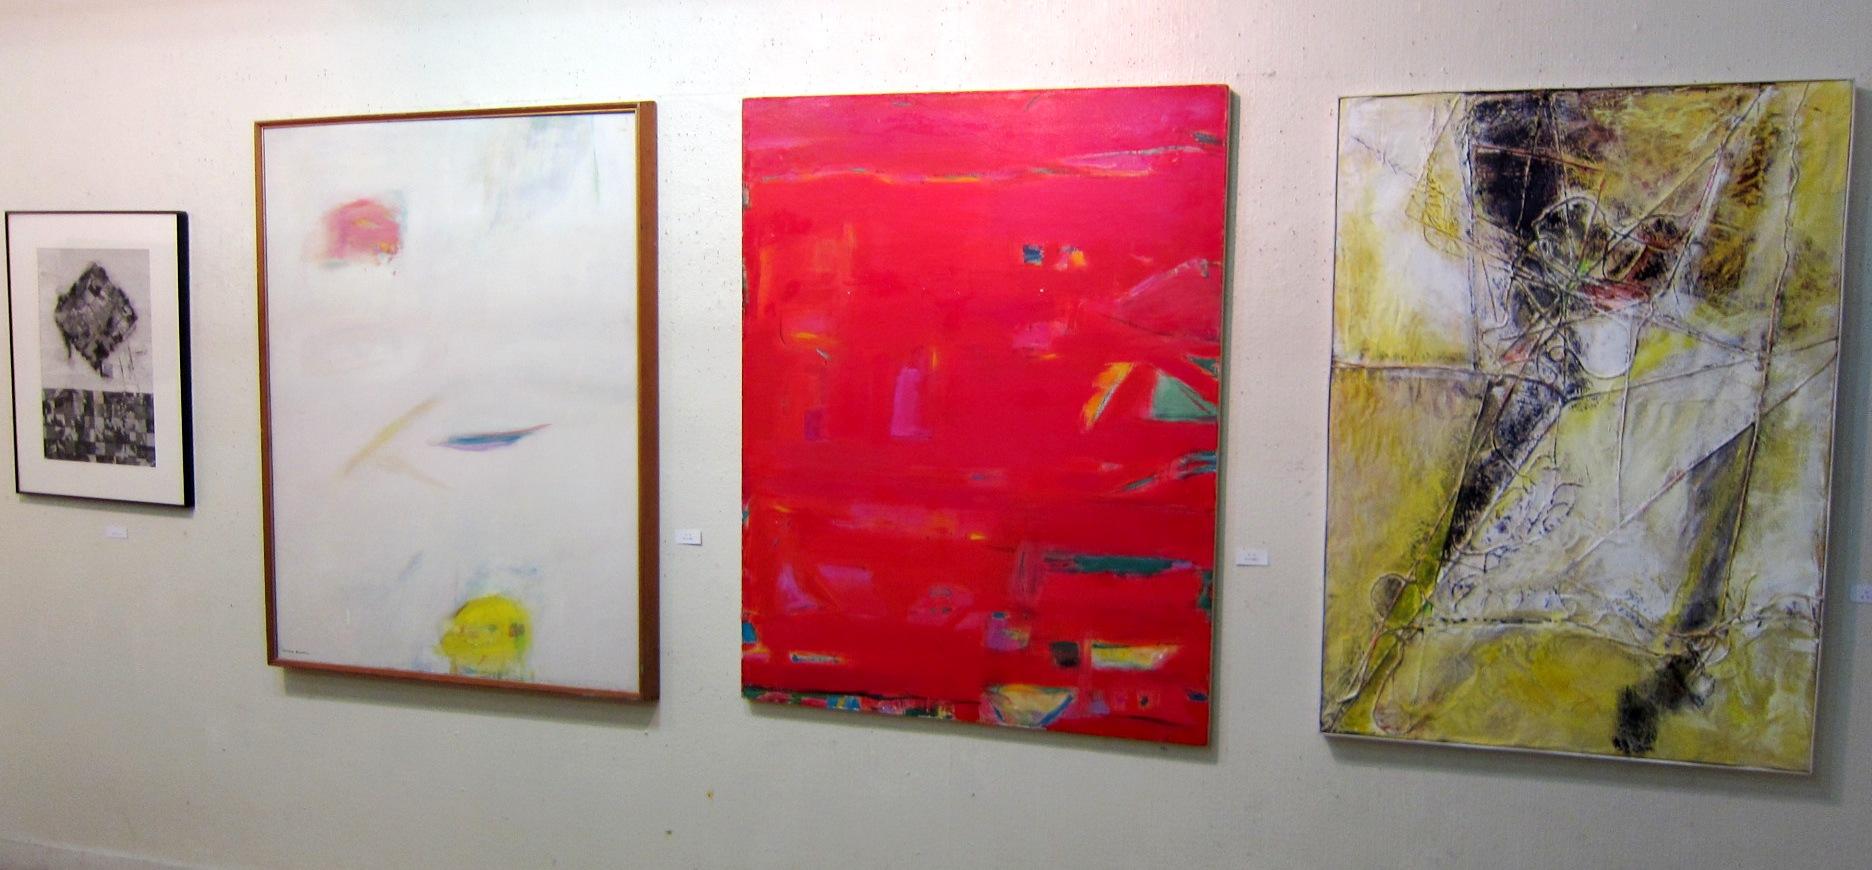 2354) 「LA`TAPIO -Ⅱ- Exhibition」 たぴお 1月27日(月)~2月15日(土)_f0126829_9584196.jpg